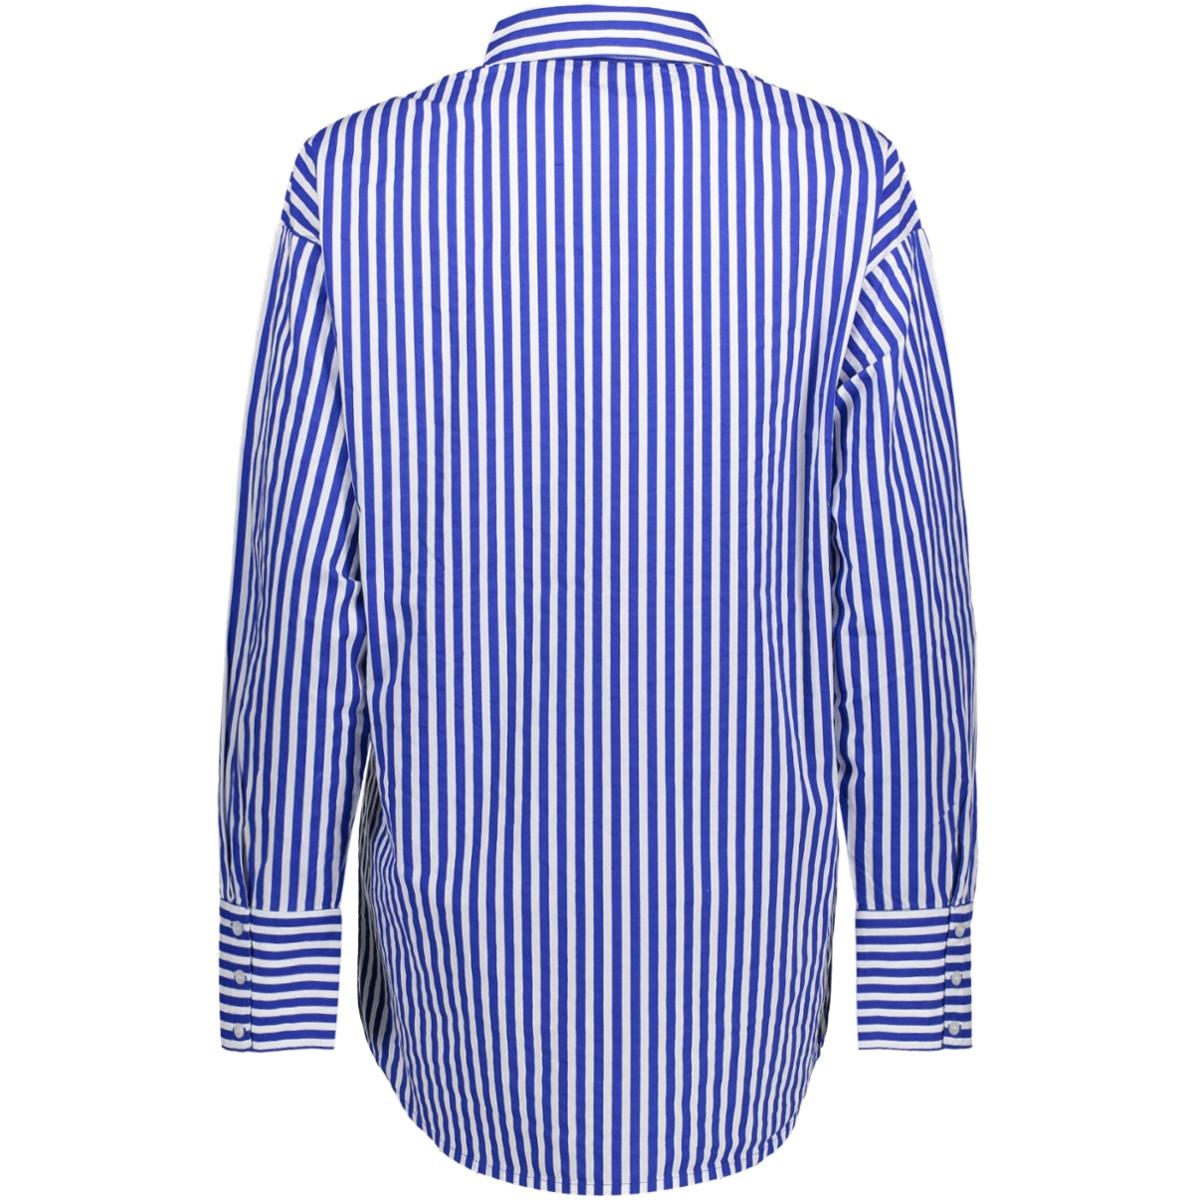 vmcannes l/s long shirt o17 10196220 vero moda blouse surf the web